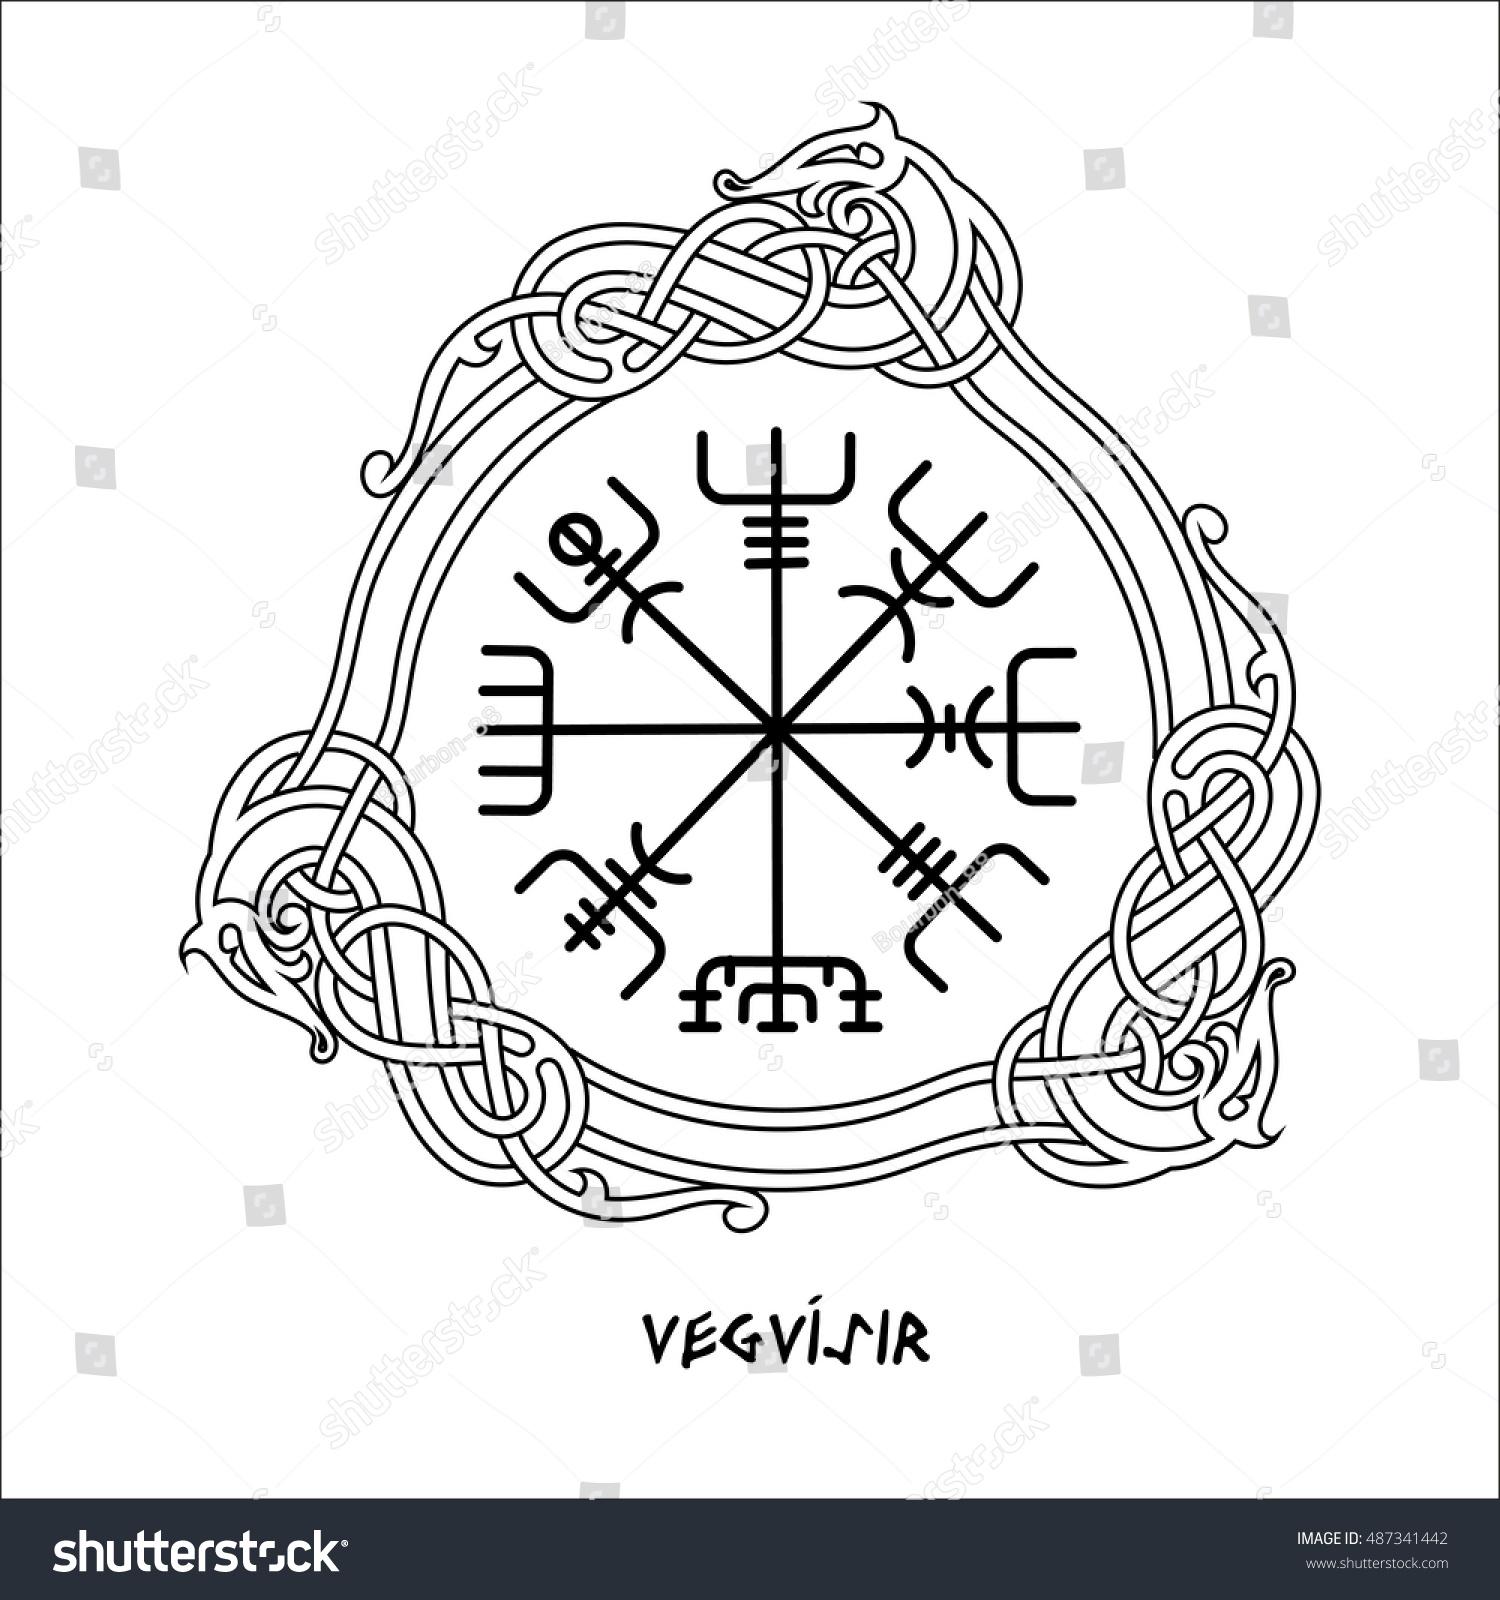 Vegvisir Magic Navigation Compass Ancient Icelandic Stock Vector